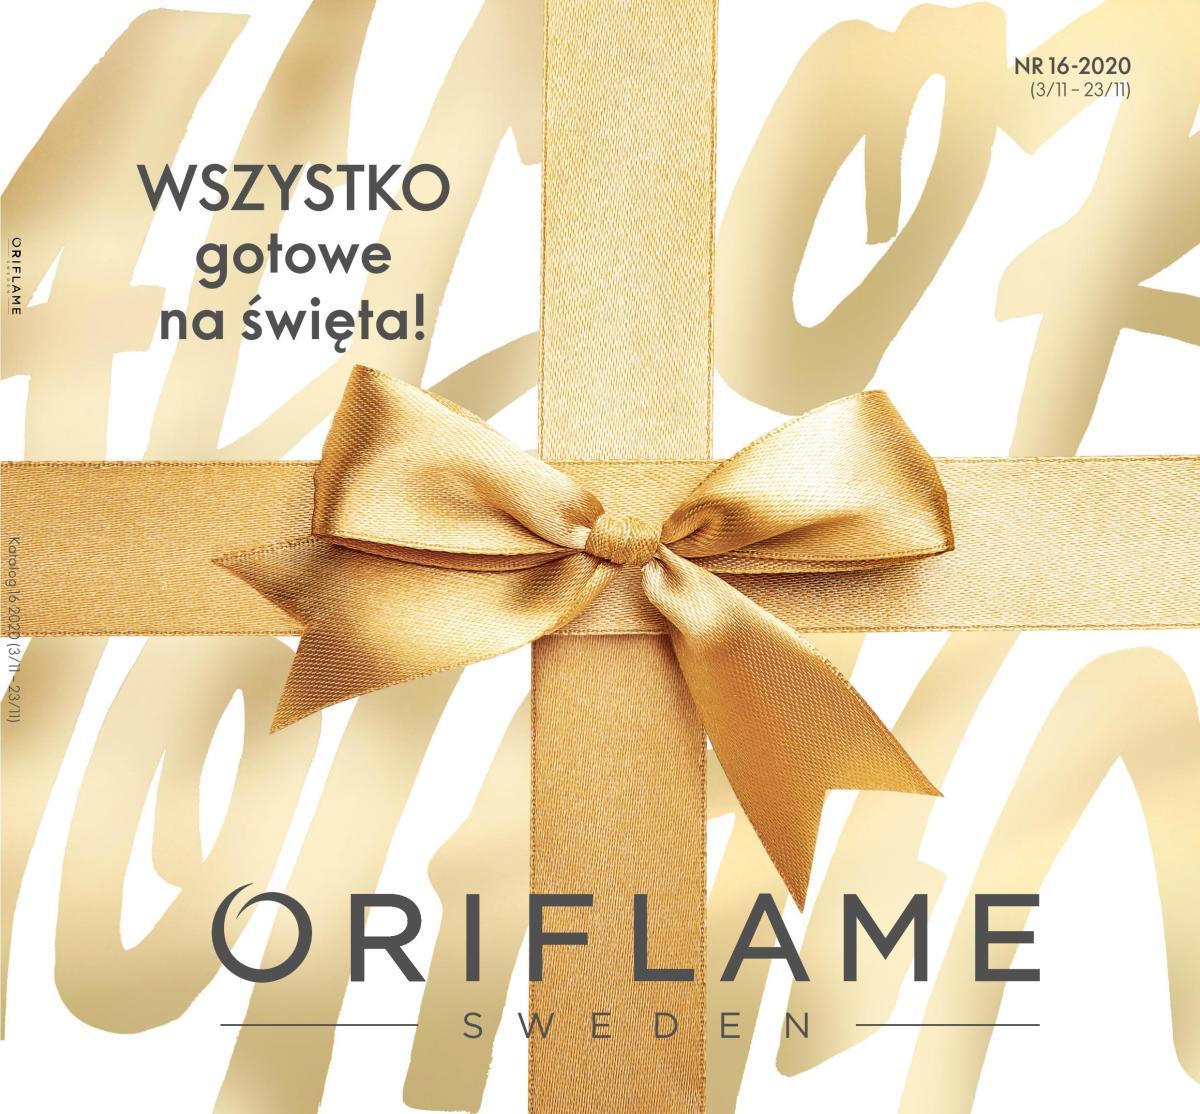 Gazetka Oriflame - Katalog nr 16-2020